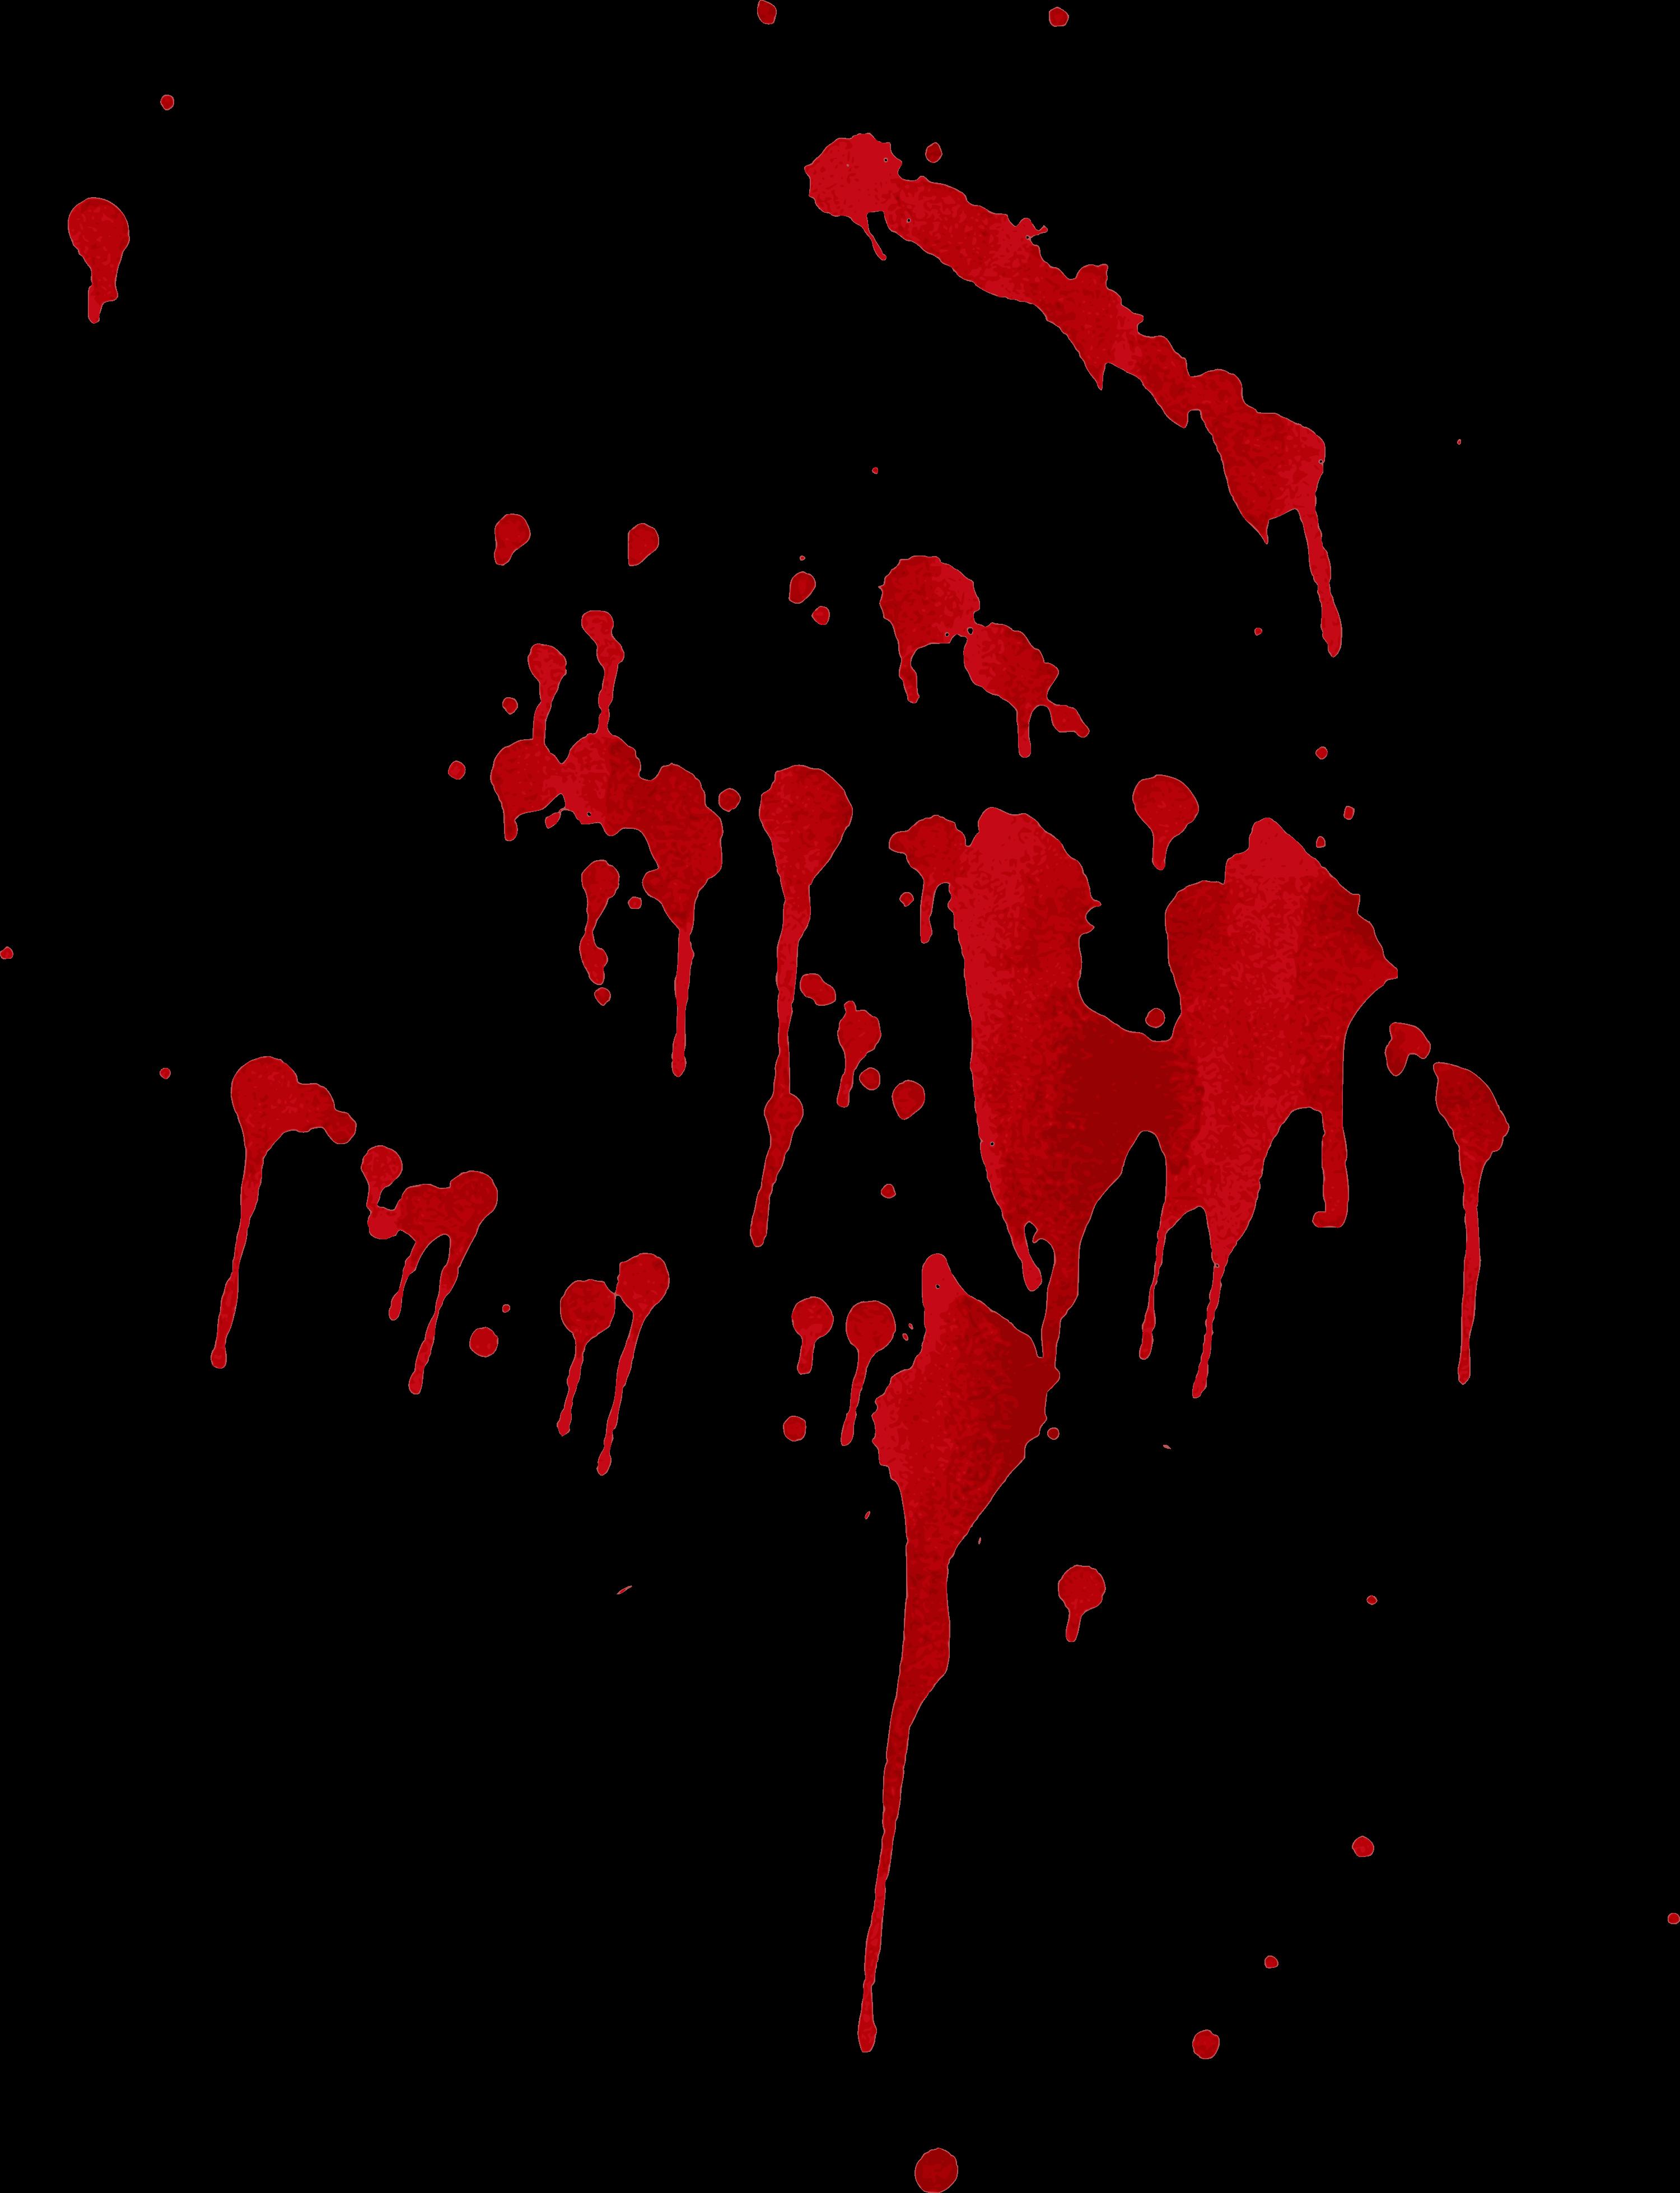 8 Blood Splatter Drip (PNG Transparent).